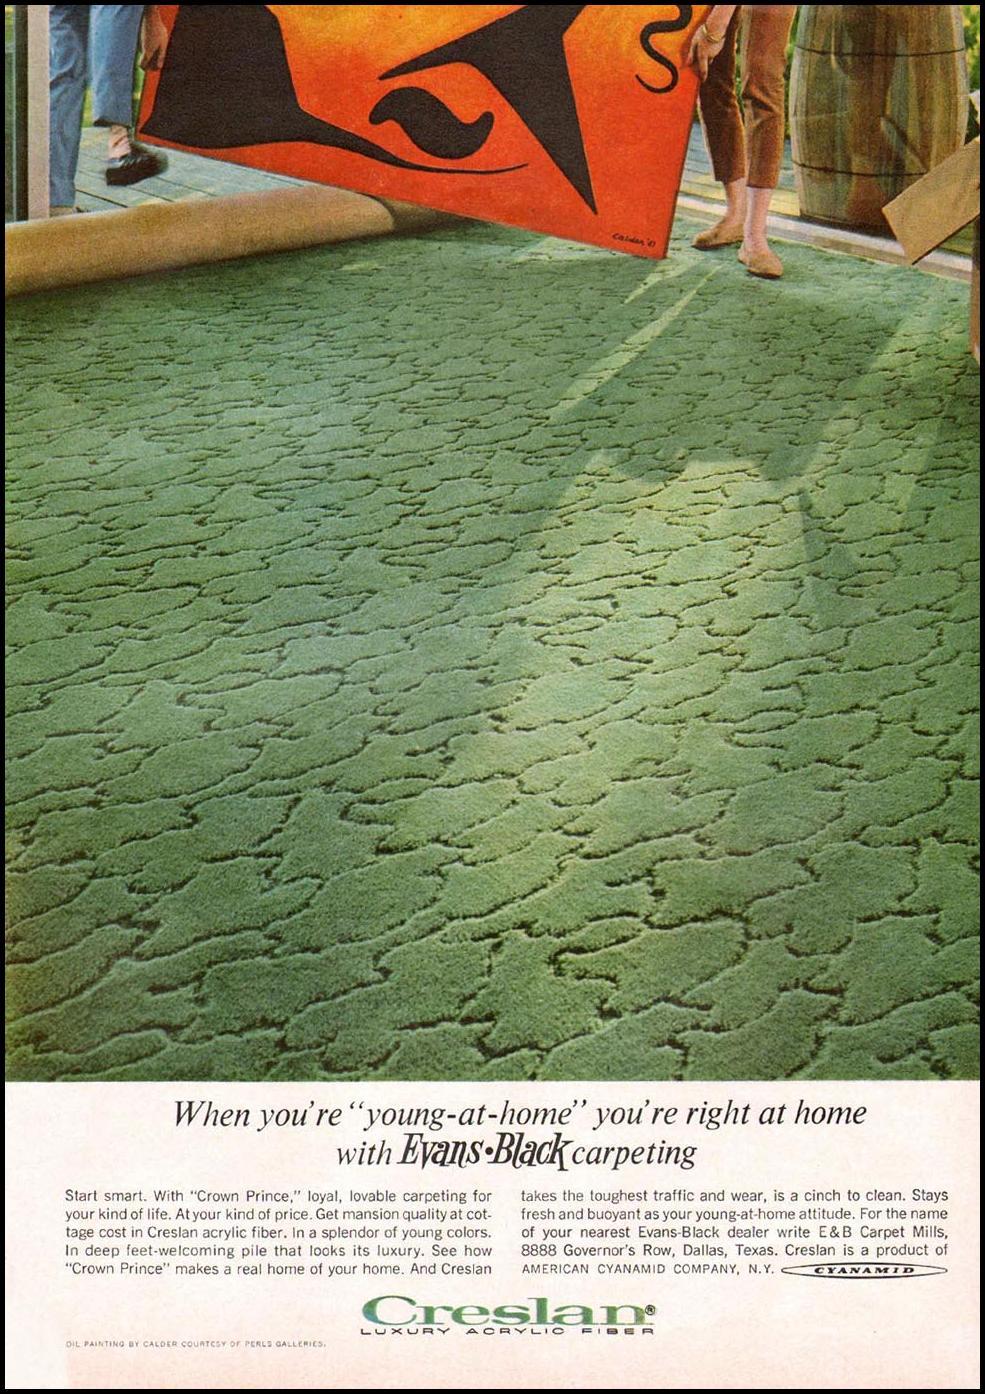 EVANS-BLACK CRESLAN HOME CARPET GOOD HOUSEKEEPING 10/01/1965 p. 242